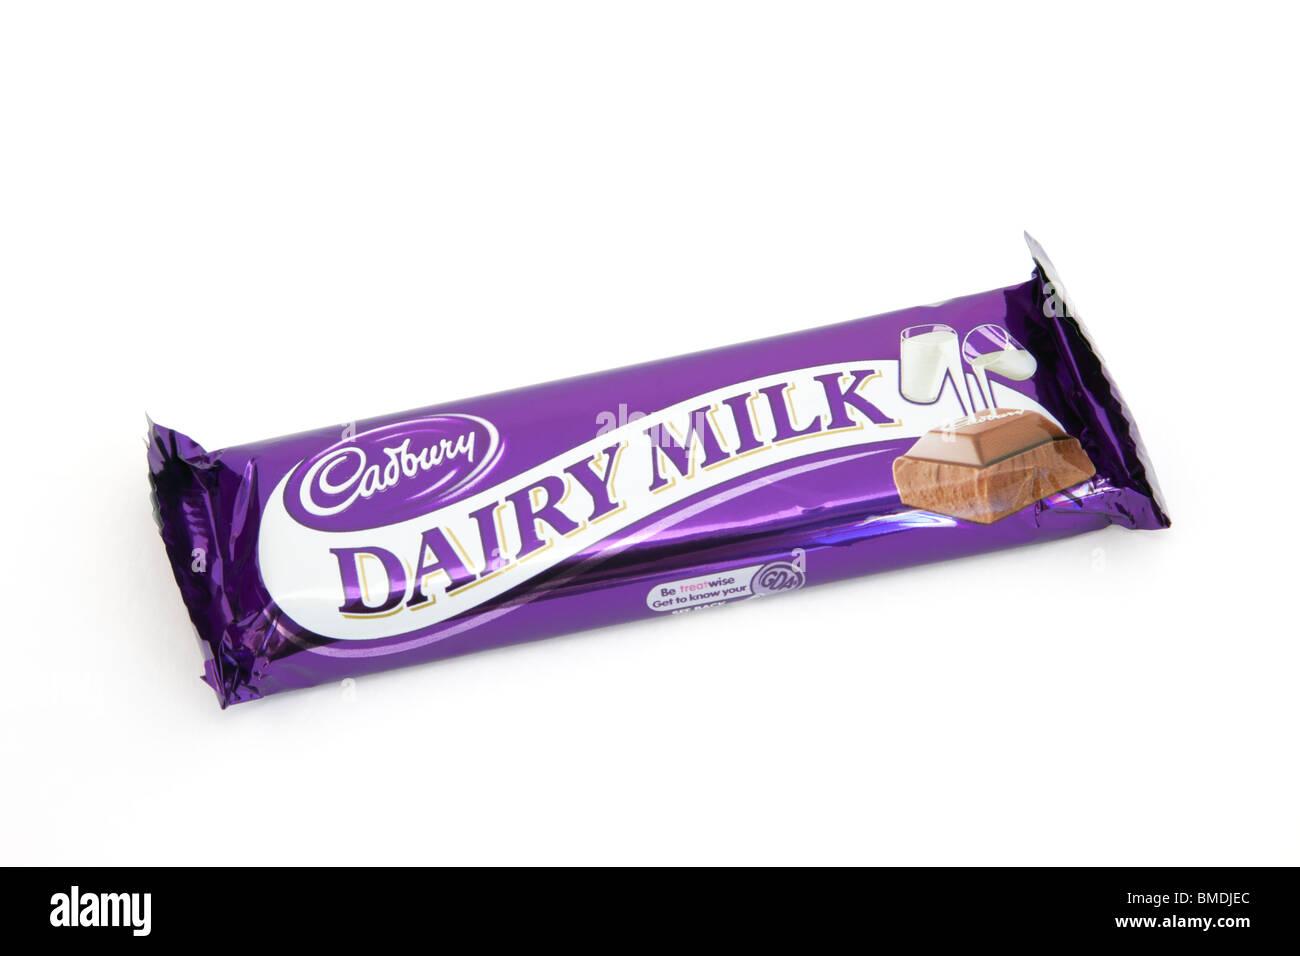 Chocolate Wrapper Imágenes De Stock & Chocolate Wrapper Fotos De ...